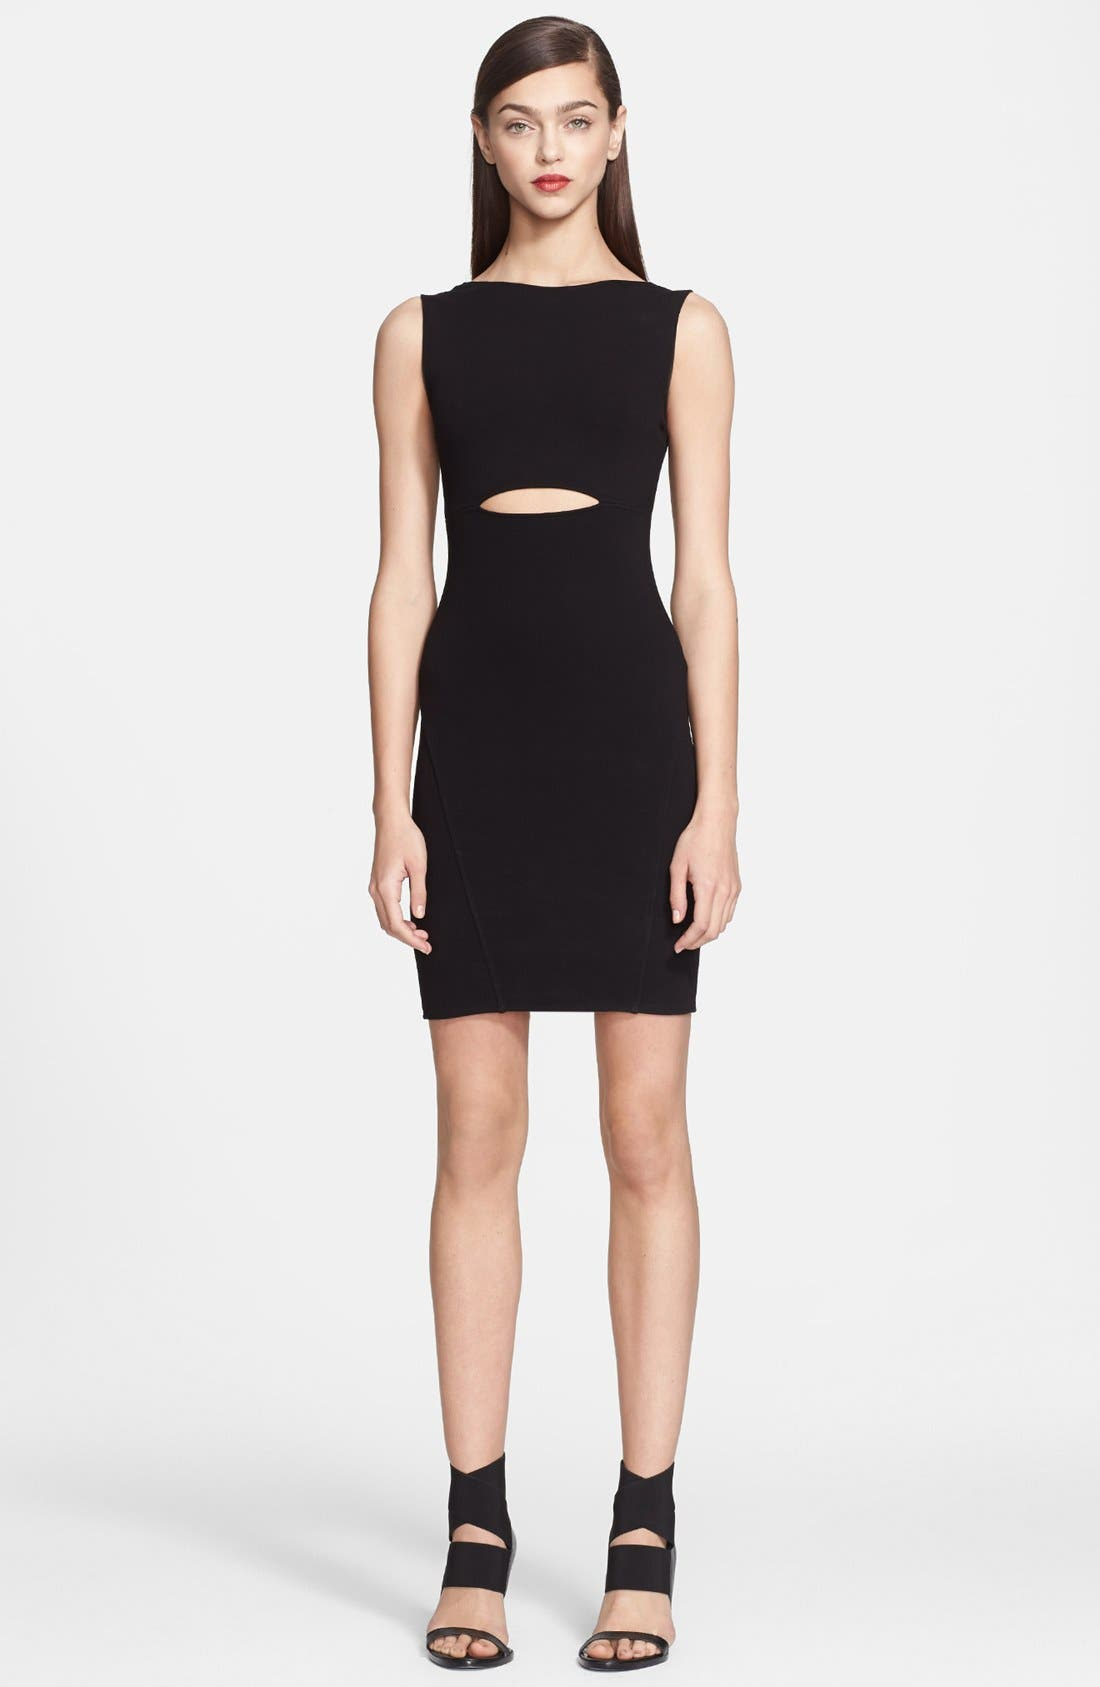 Alternate Image 1 Selected - Helmut Lang 'Gala' Knit Dress